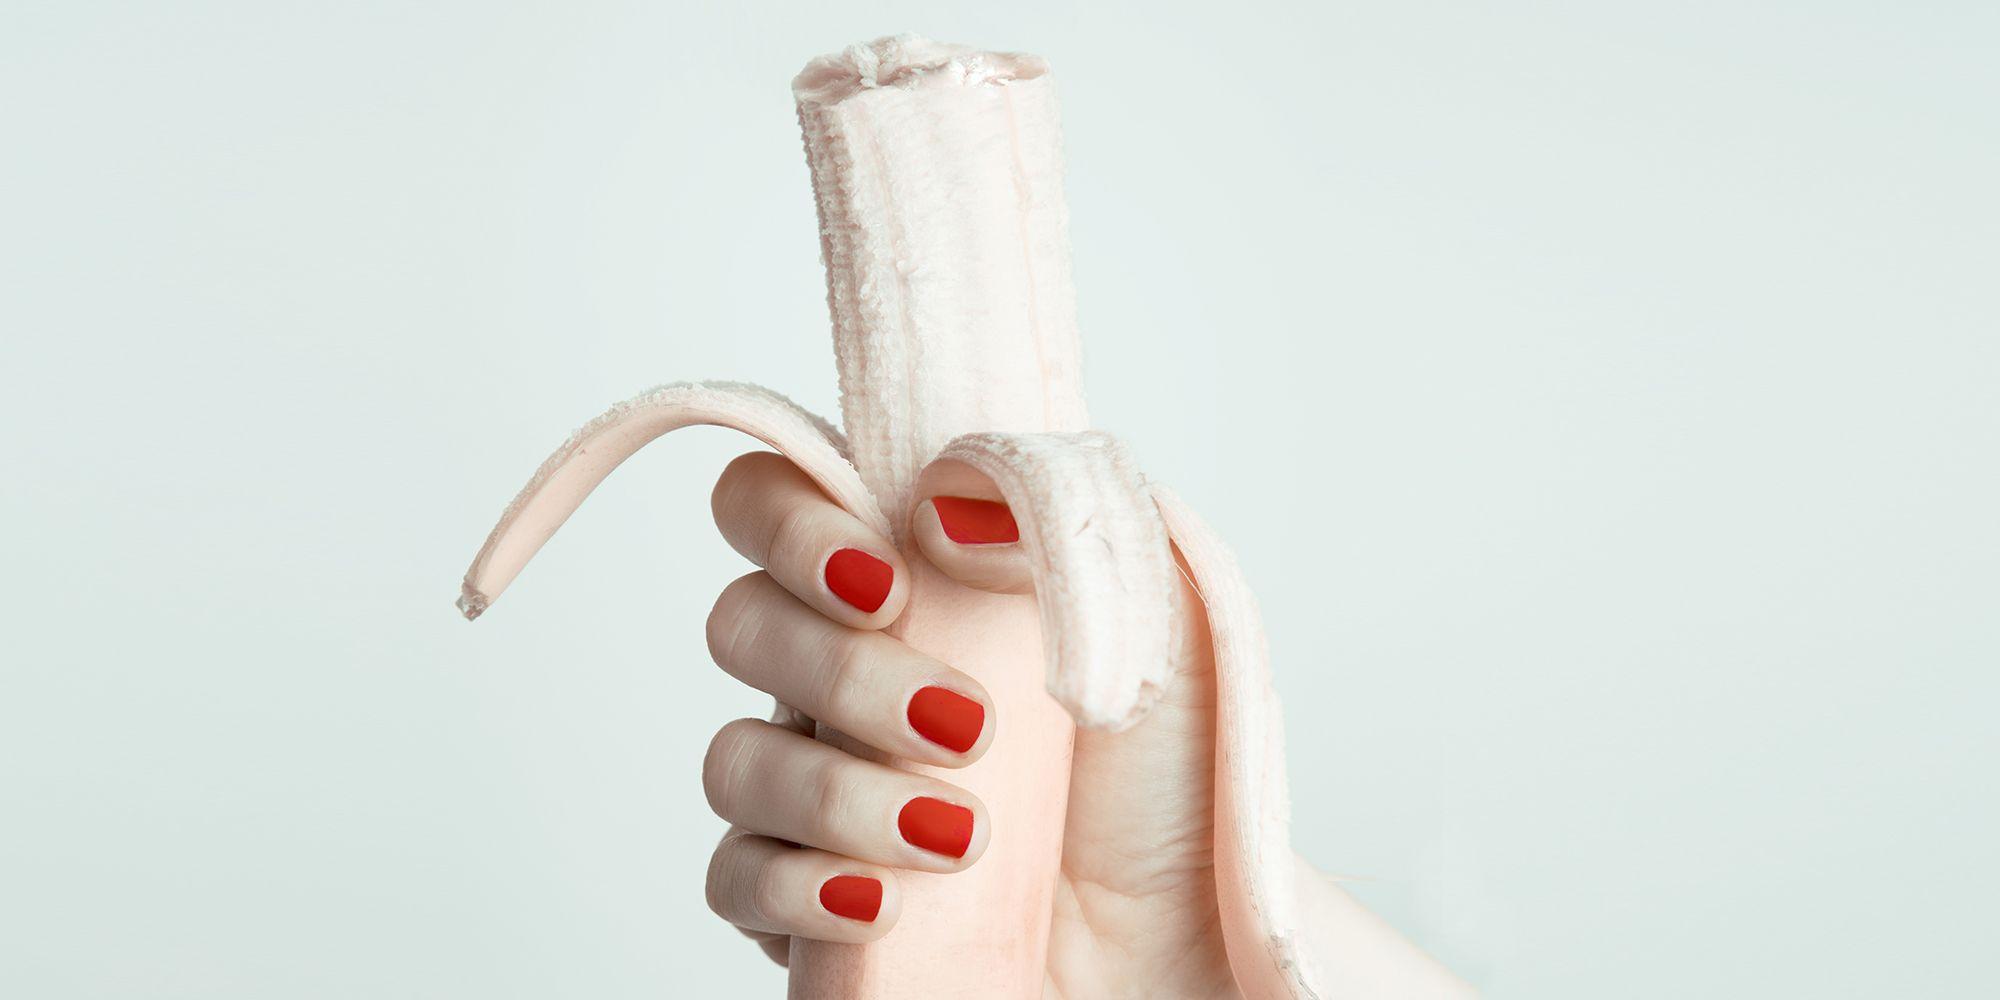 Lubricated hand jobs